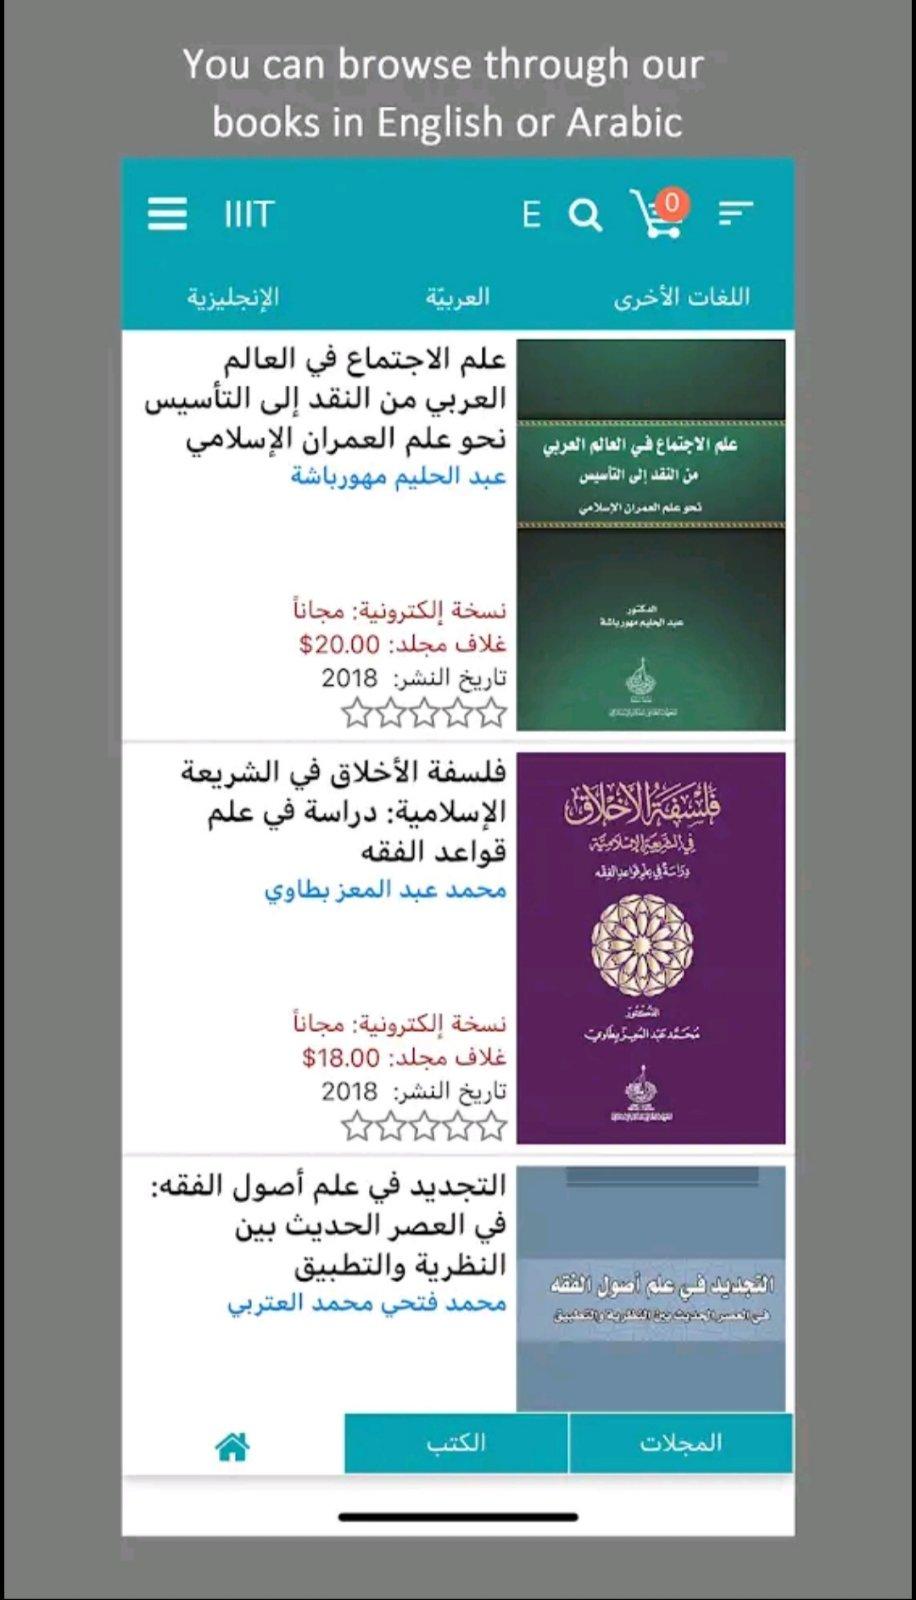 IIIT Books - Bilingual eBook Commerce Mobile App 6